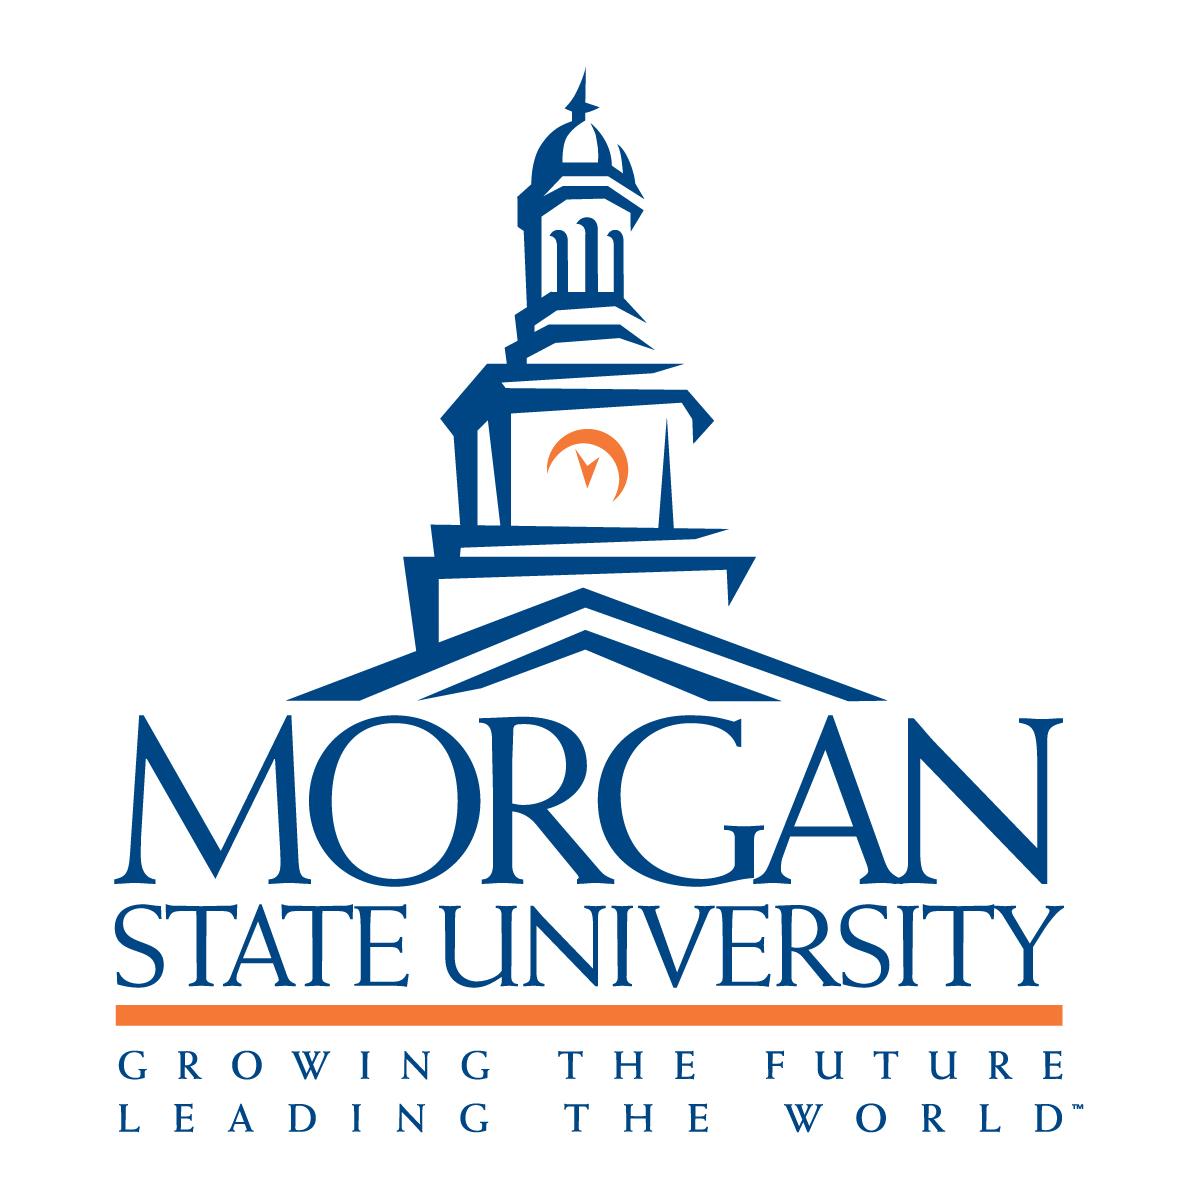 Morgan State University